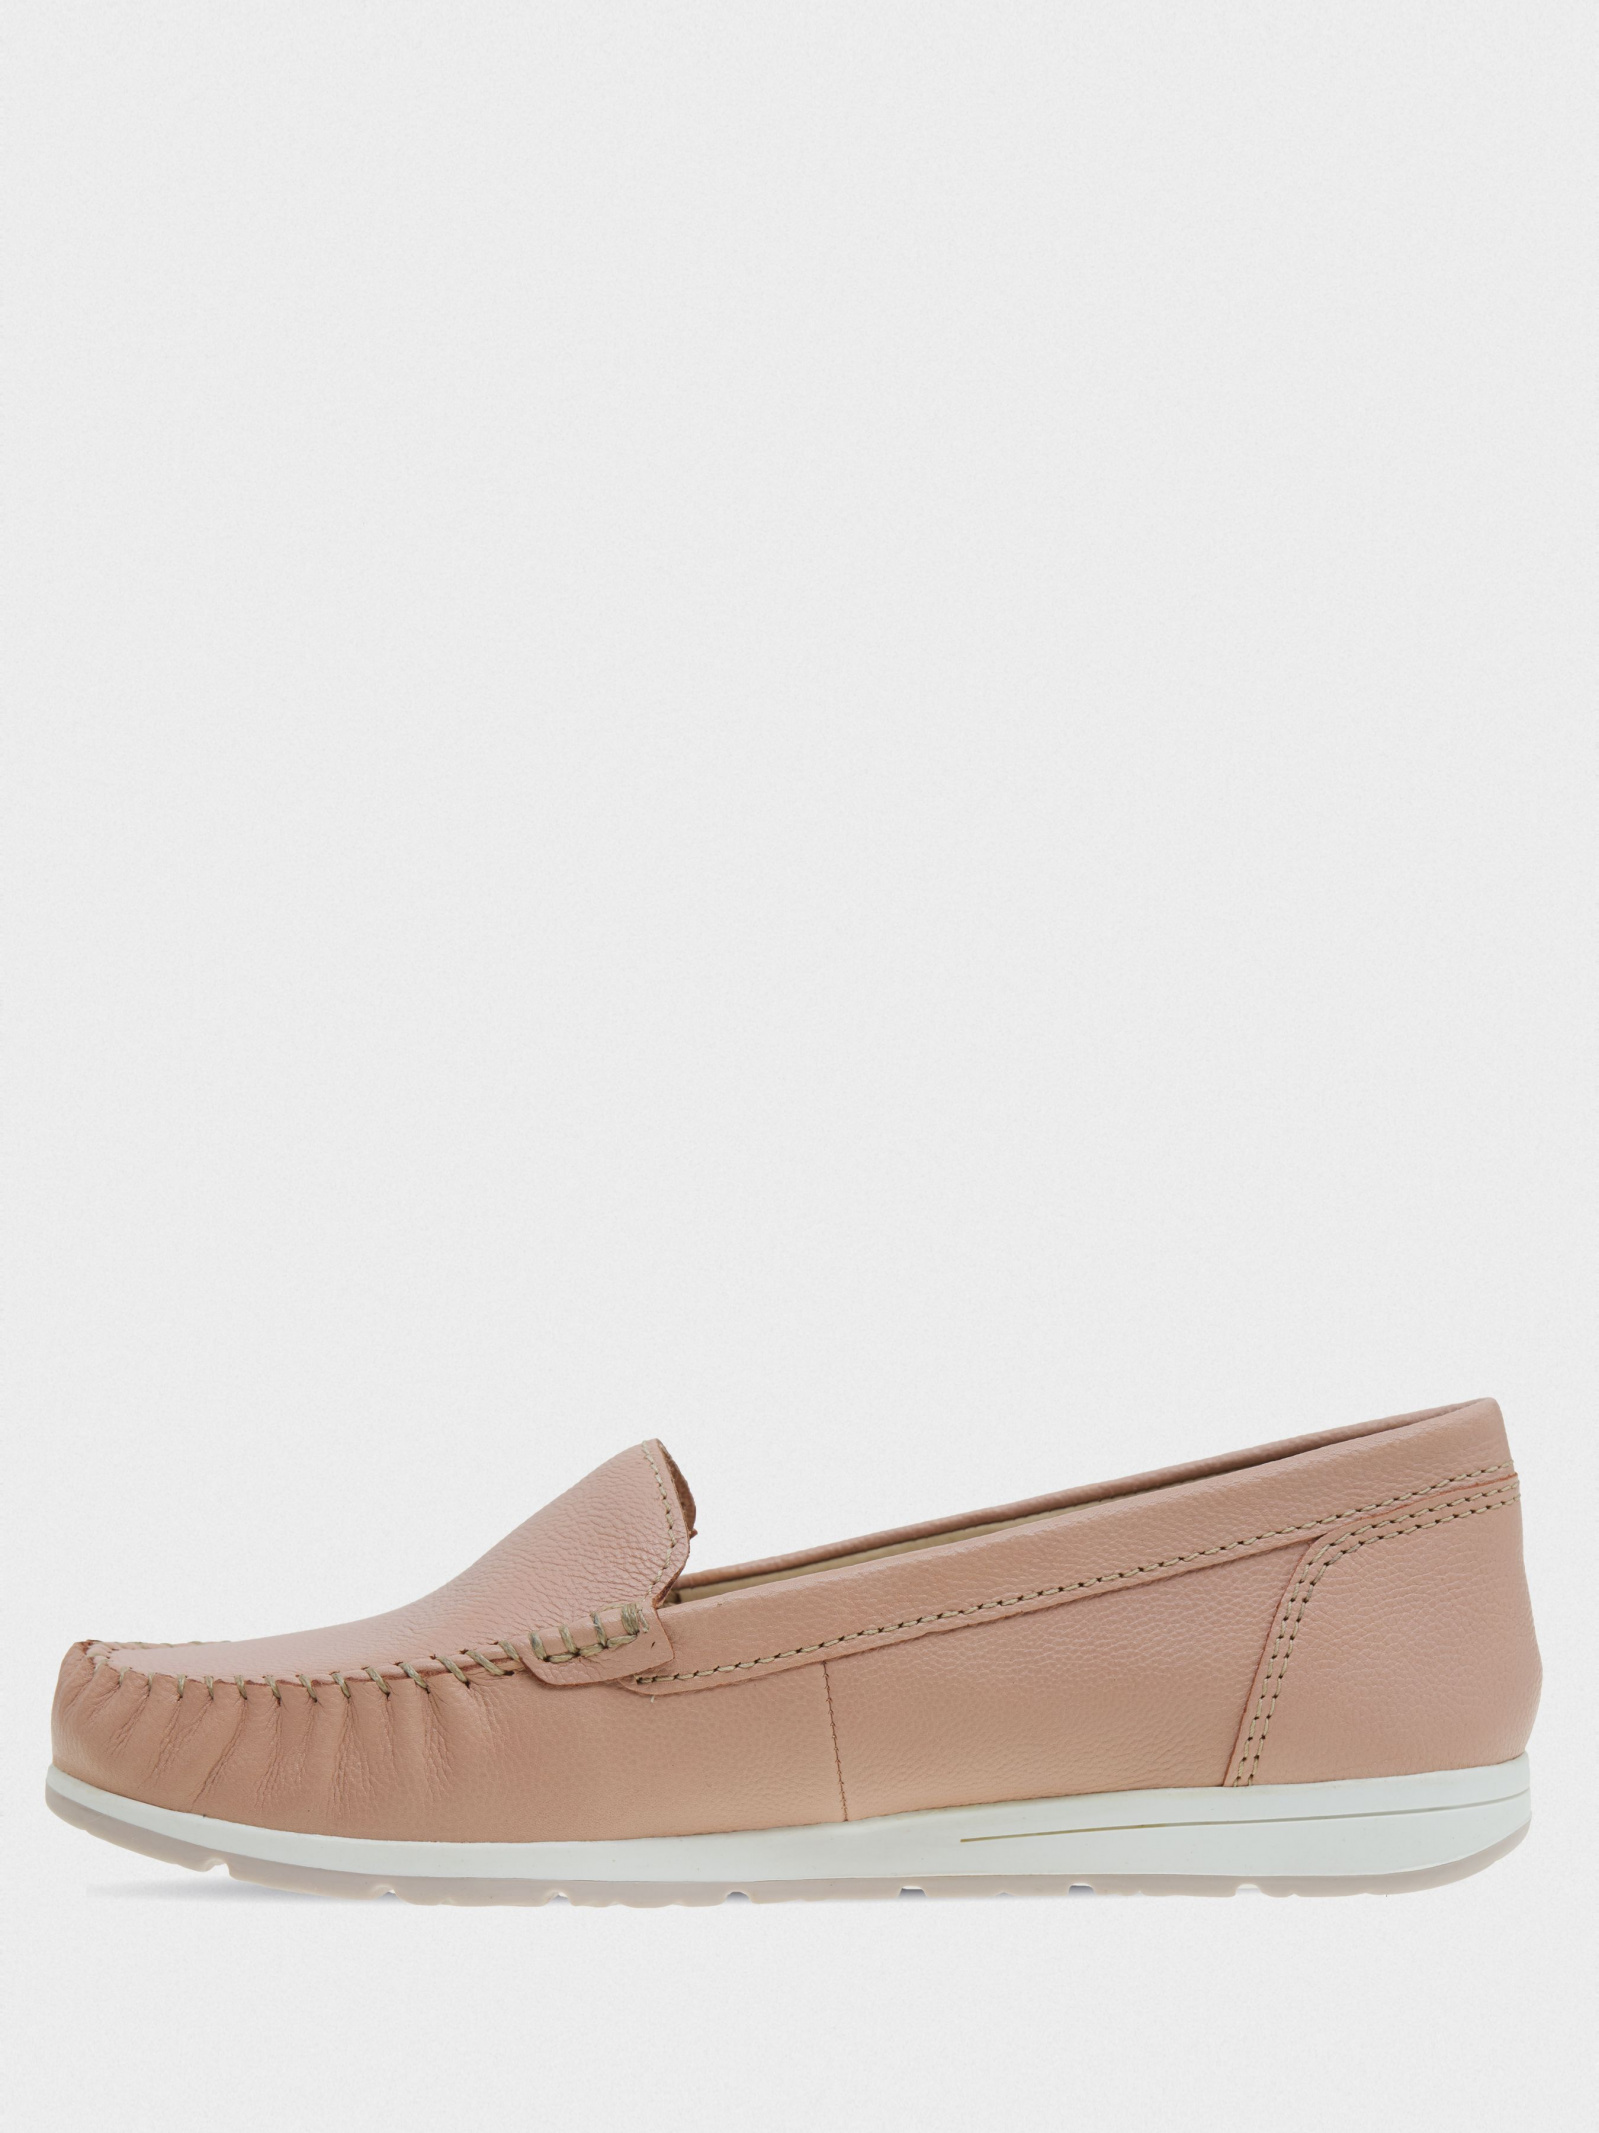 Мокасины женские Marco Tozzi 3H321 размеры обуви, 2017